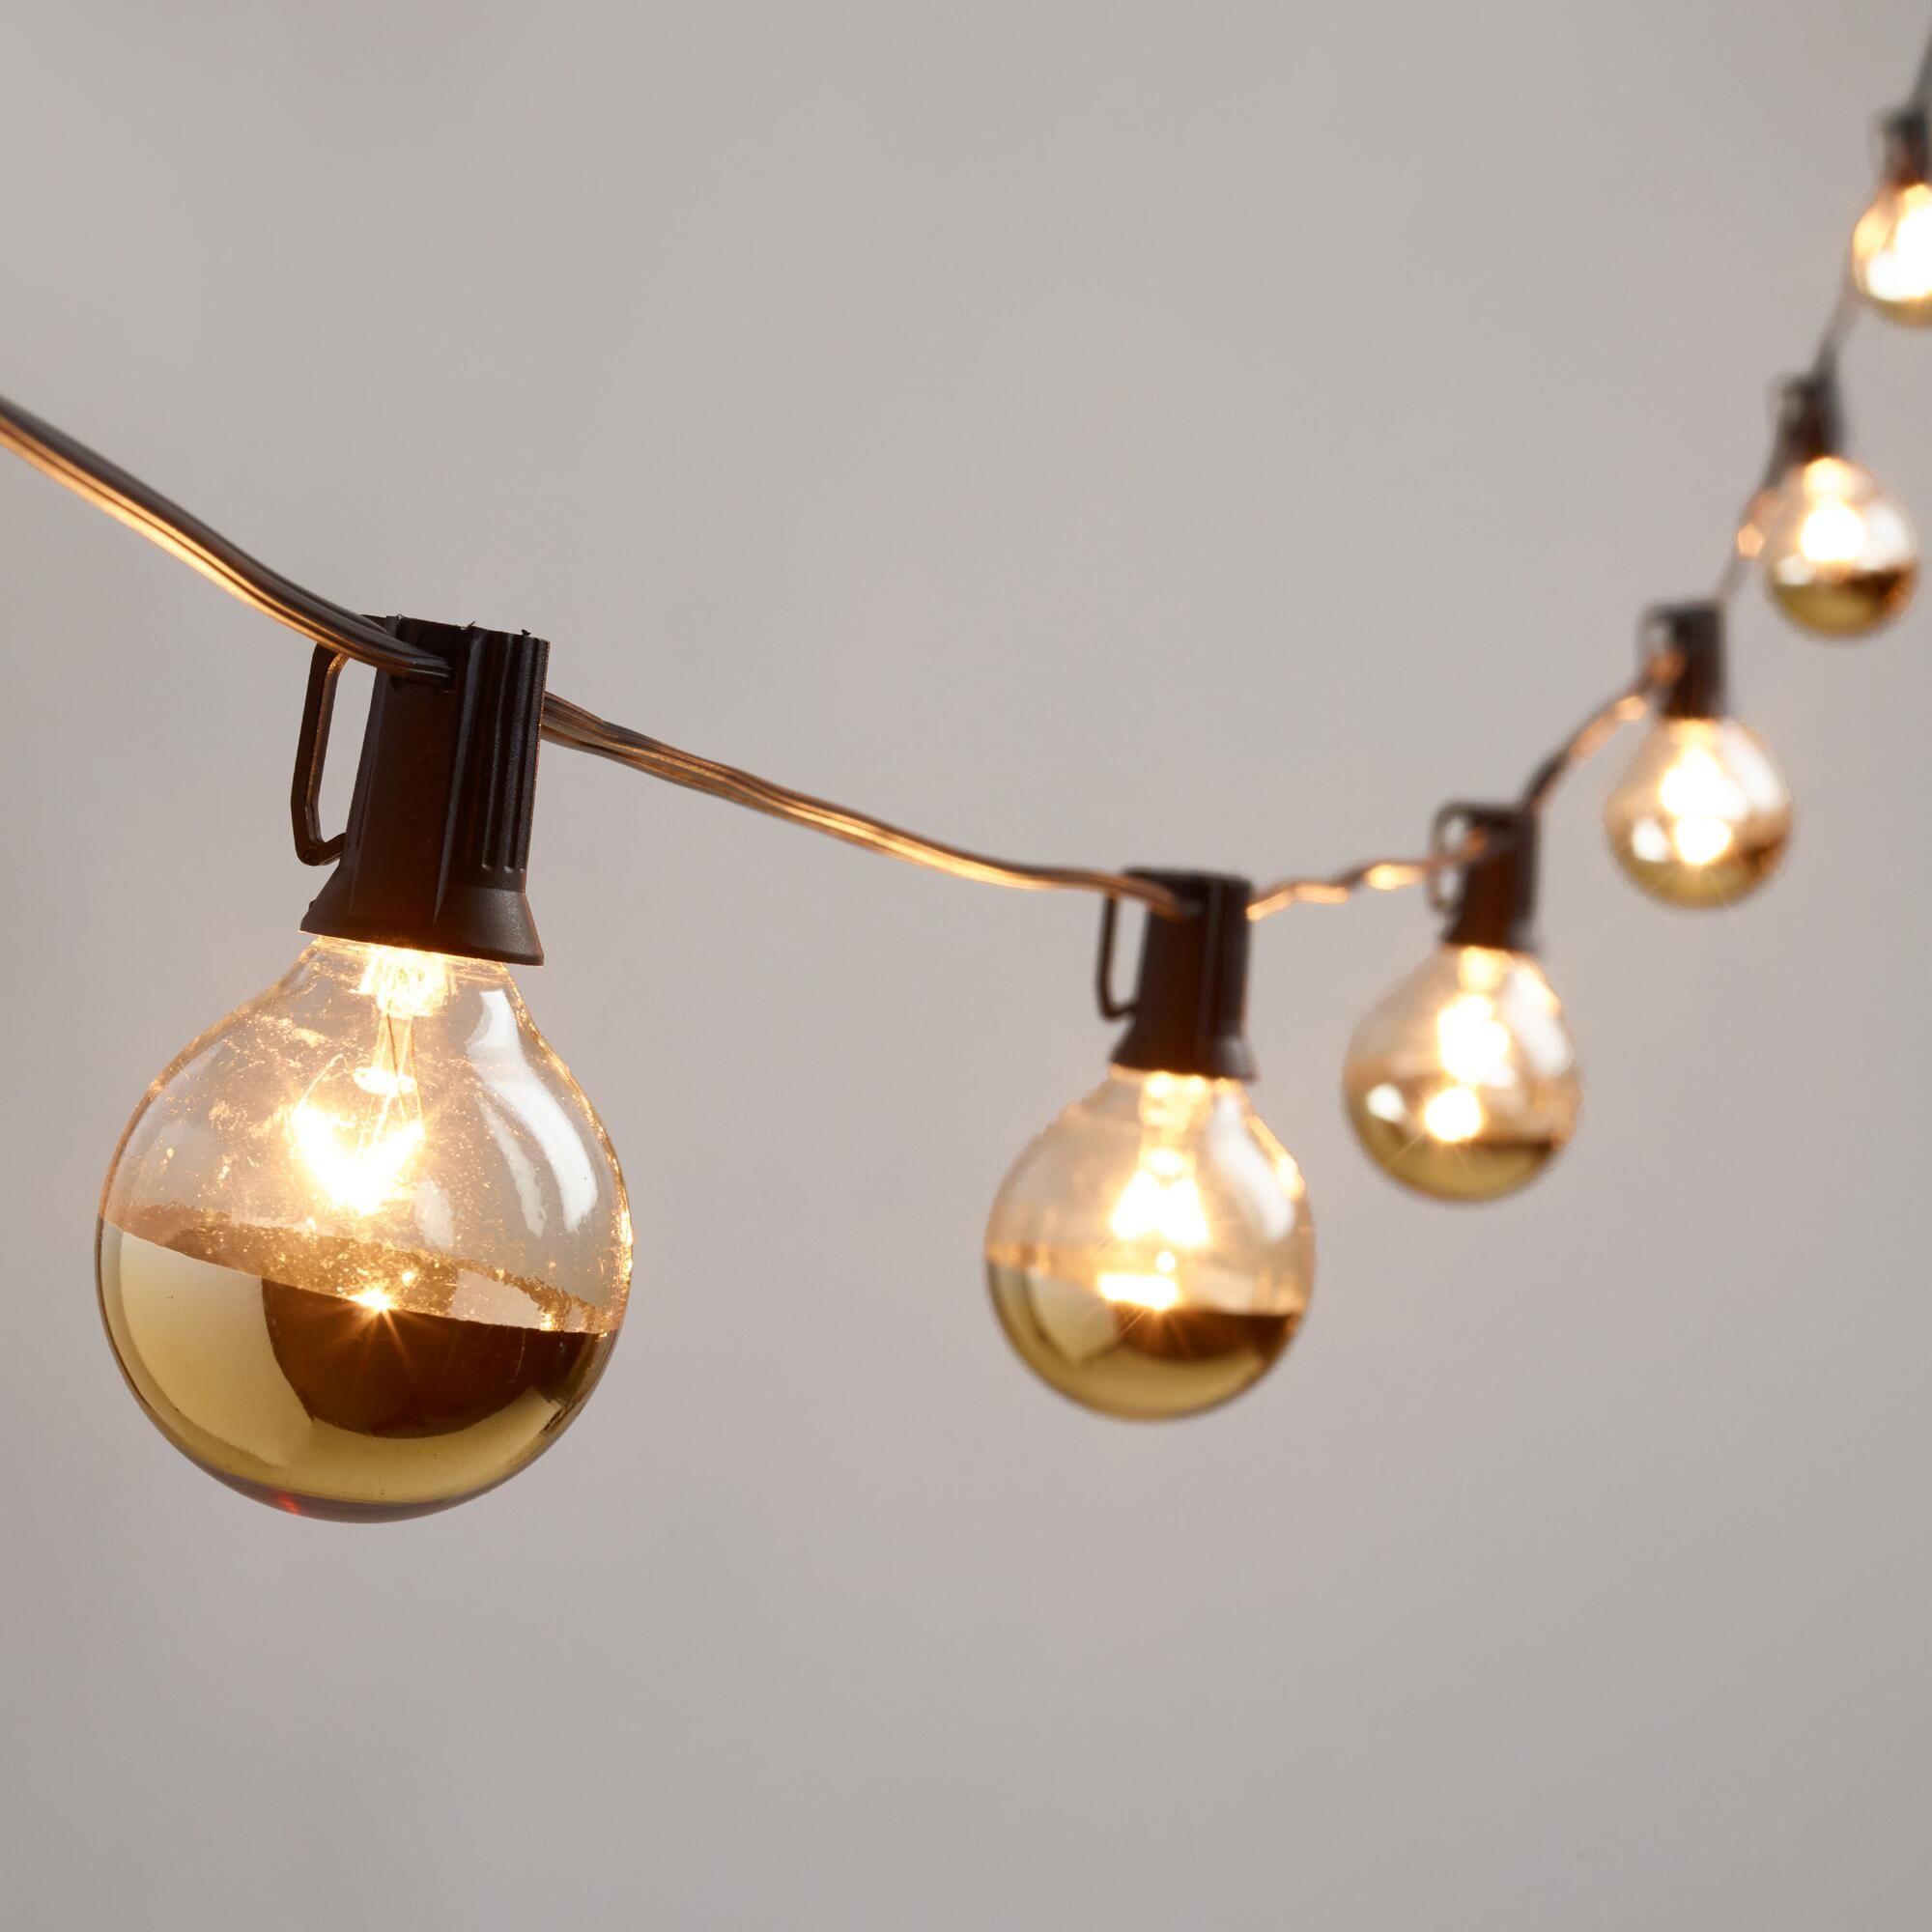 at white night shop outdoor fairy string garden lights led christmas solar set light